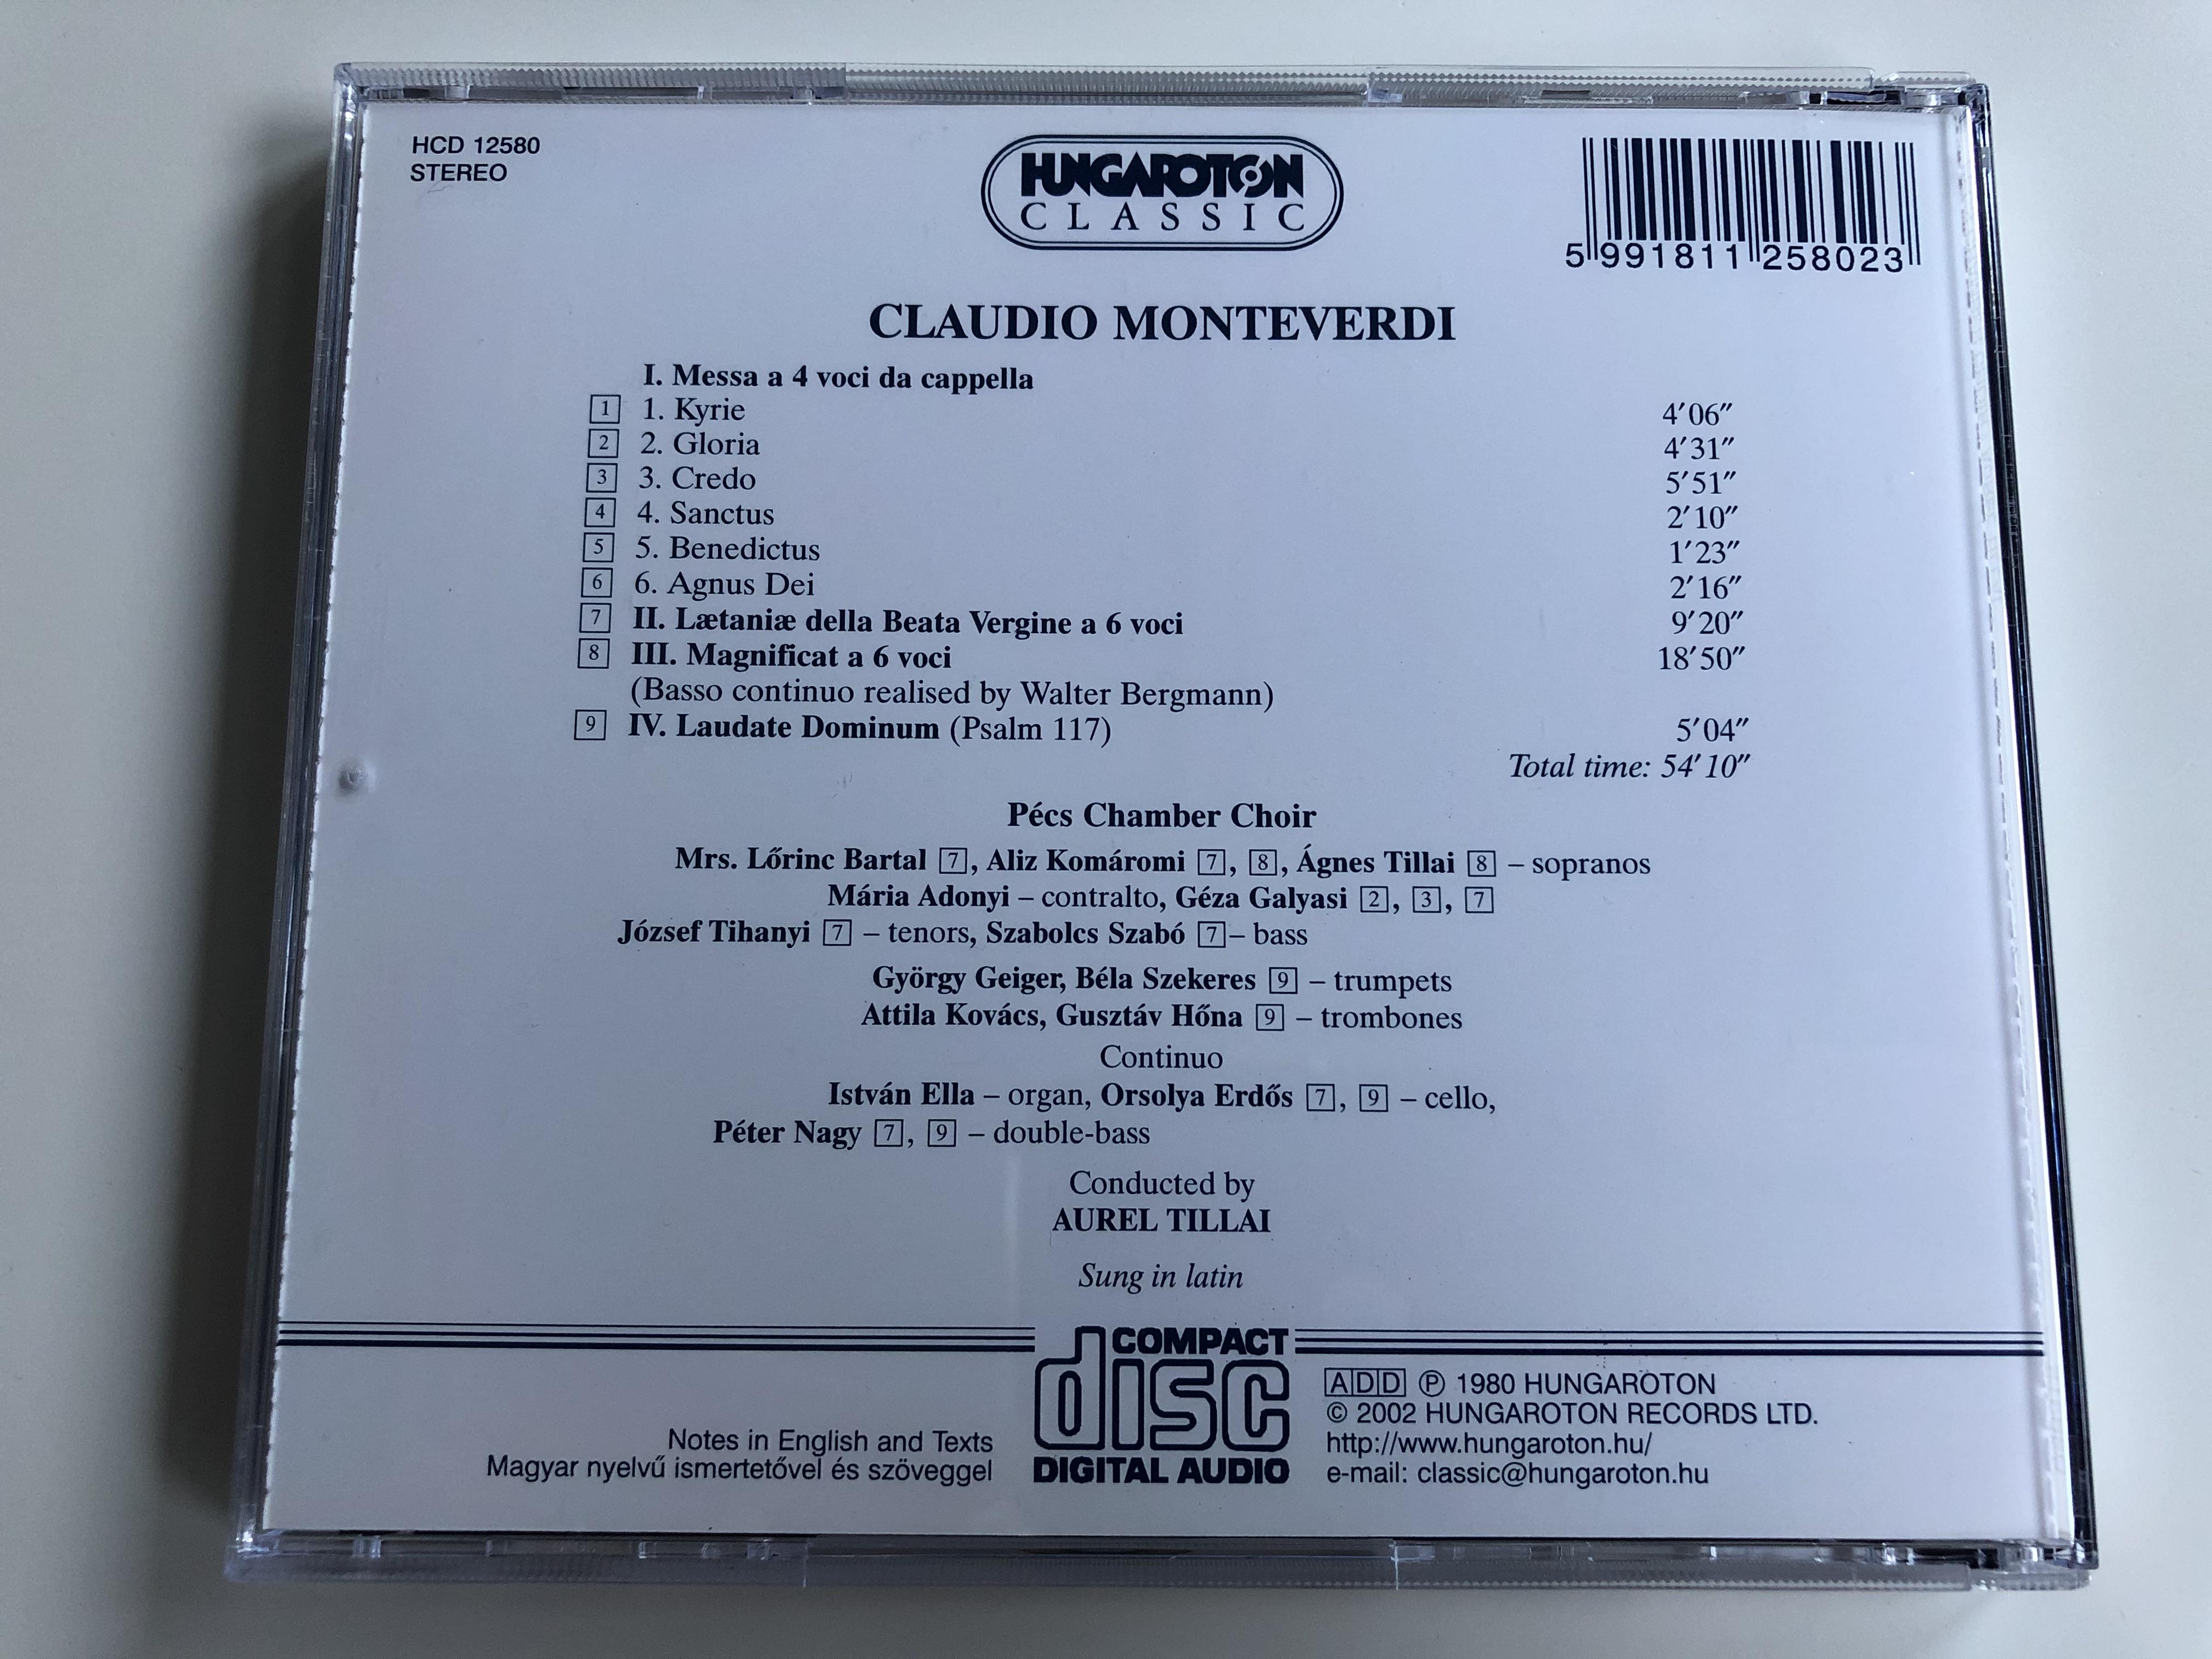 monteverdi-messa-a-4-voci-da-cappella-letanie-della-beata-vergine-a-6-voci-magnificat-a-6-voci-laudate-dominum-p-cs-chamber-choir-aur-l-tillai-hungaroton-classic-audio-cd-1980-stereo-h-11-.jpg